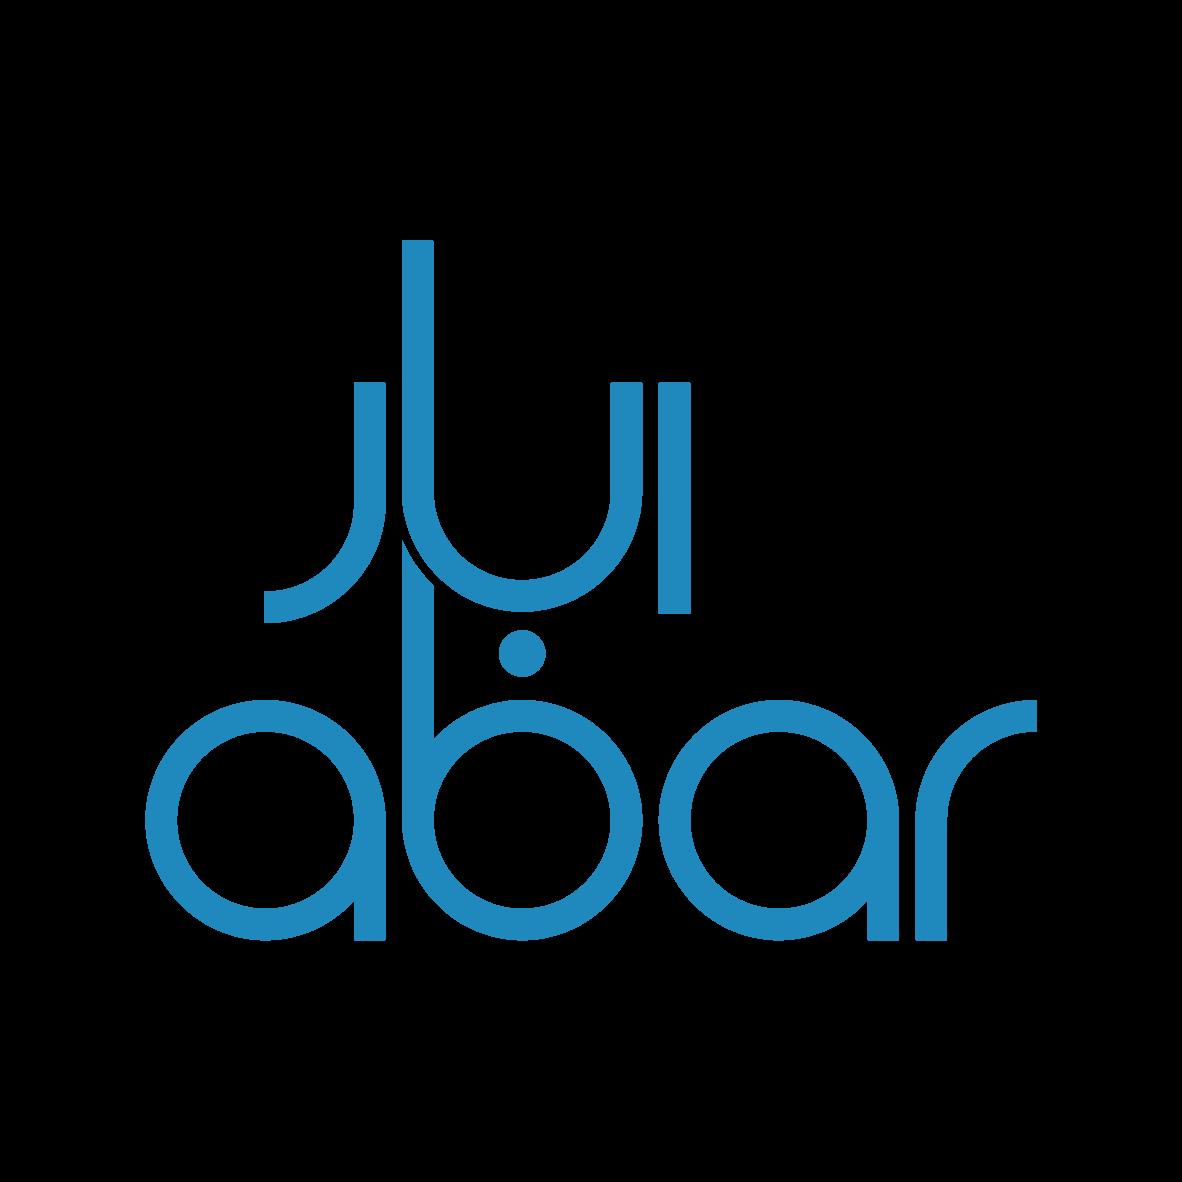 https://www.abar.app/storage/app/uploads/public/60d/507/74e/60d50774ec421924092832.png